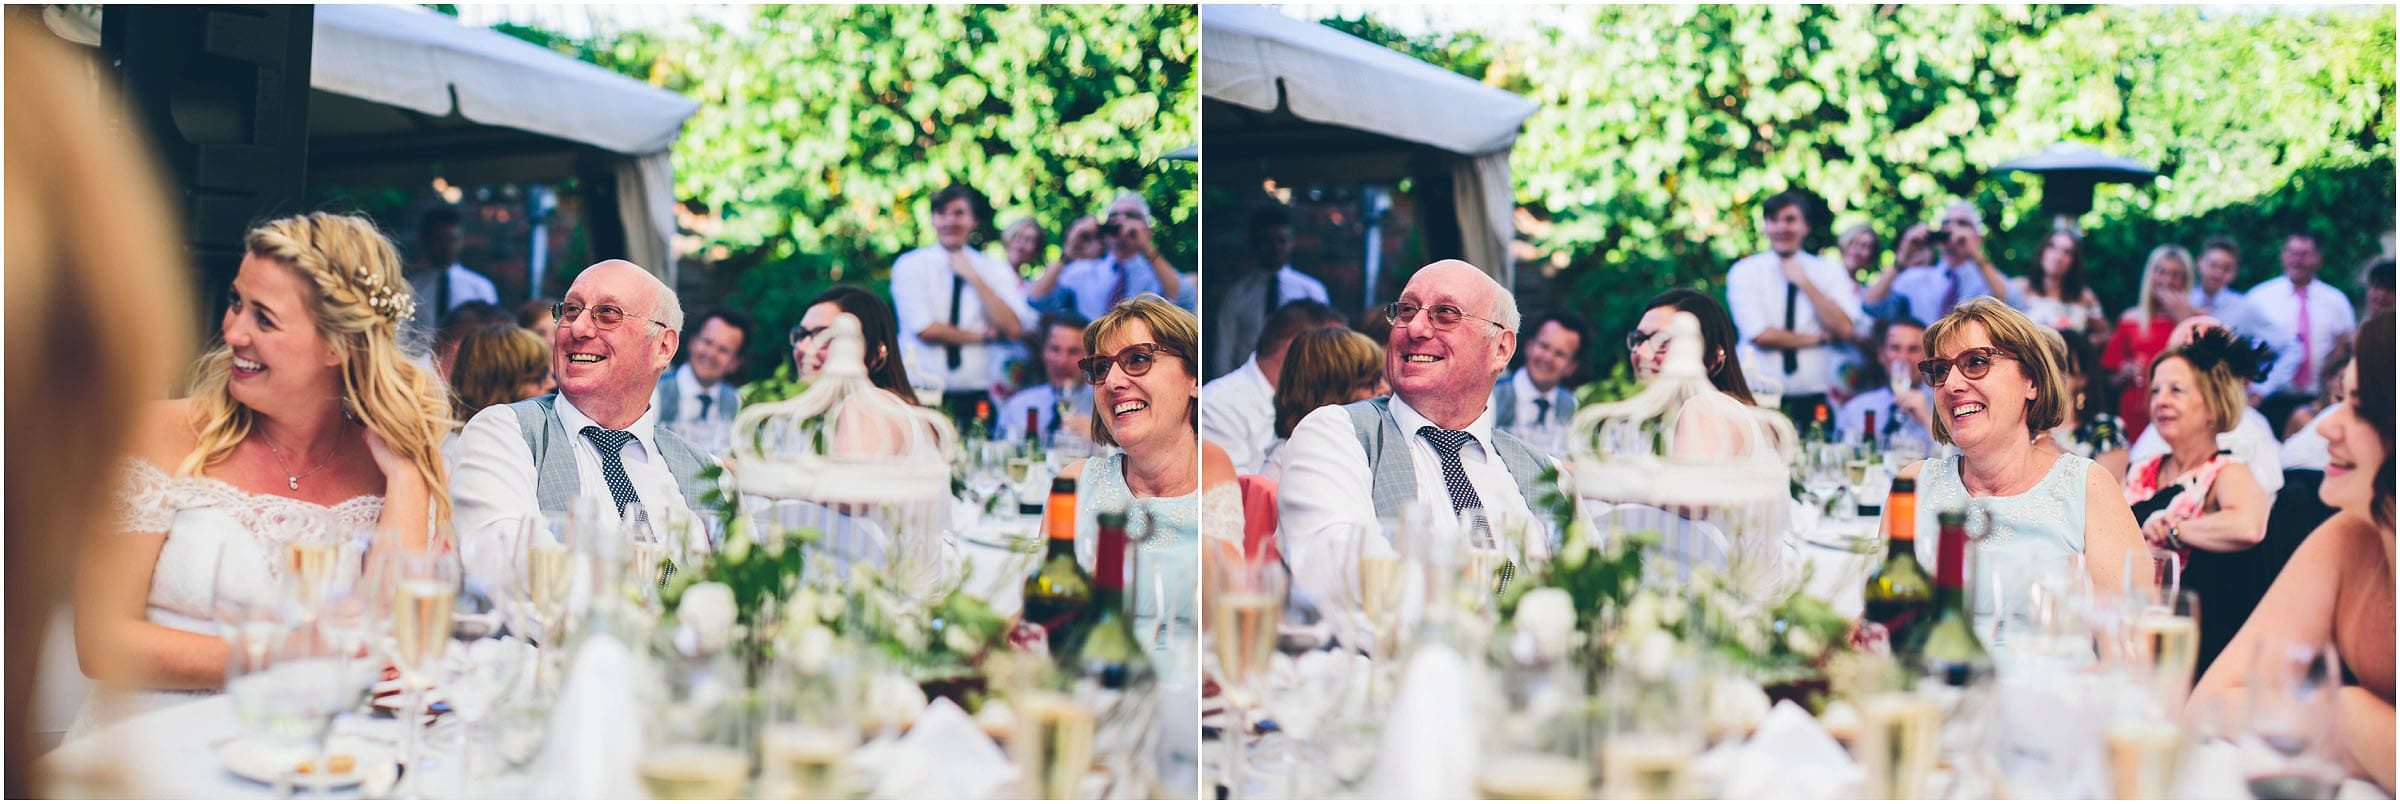 Kensington_Roof_Gardens_Wedding_Photography_0097